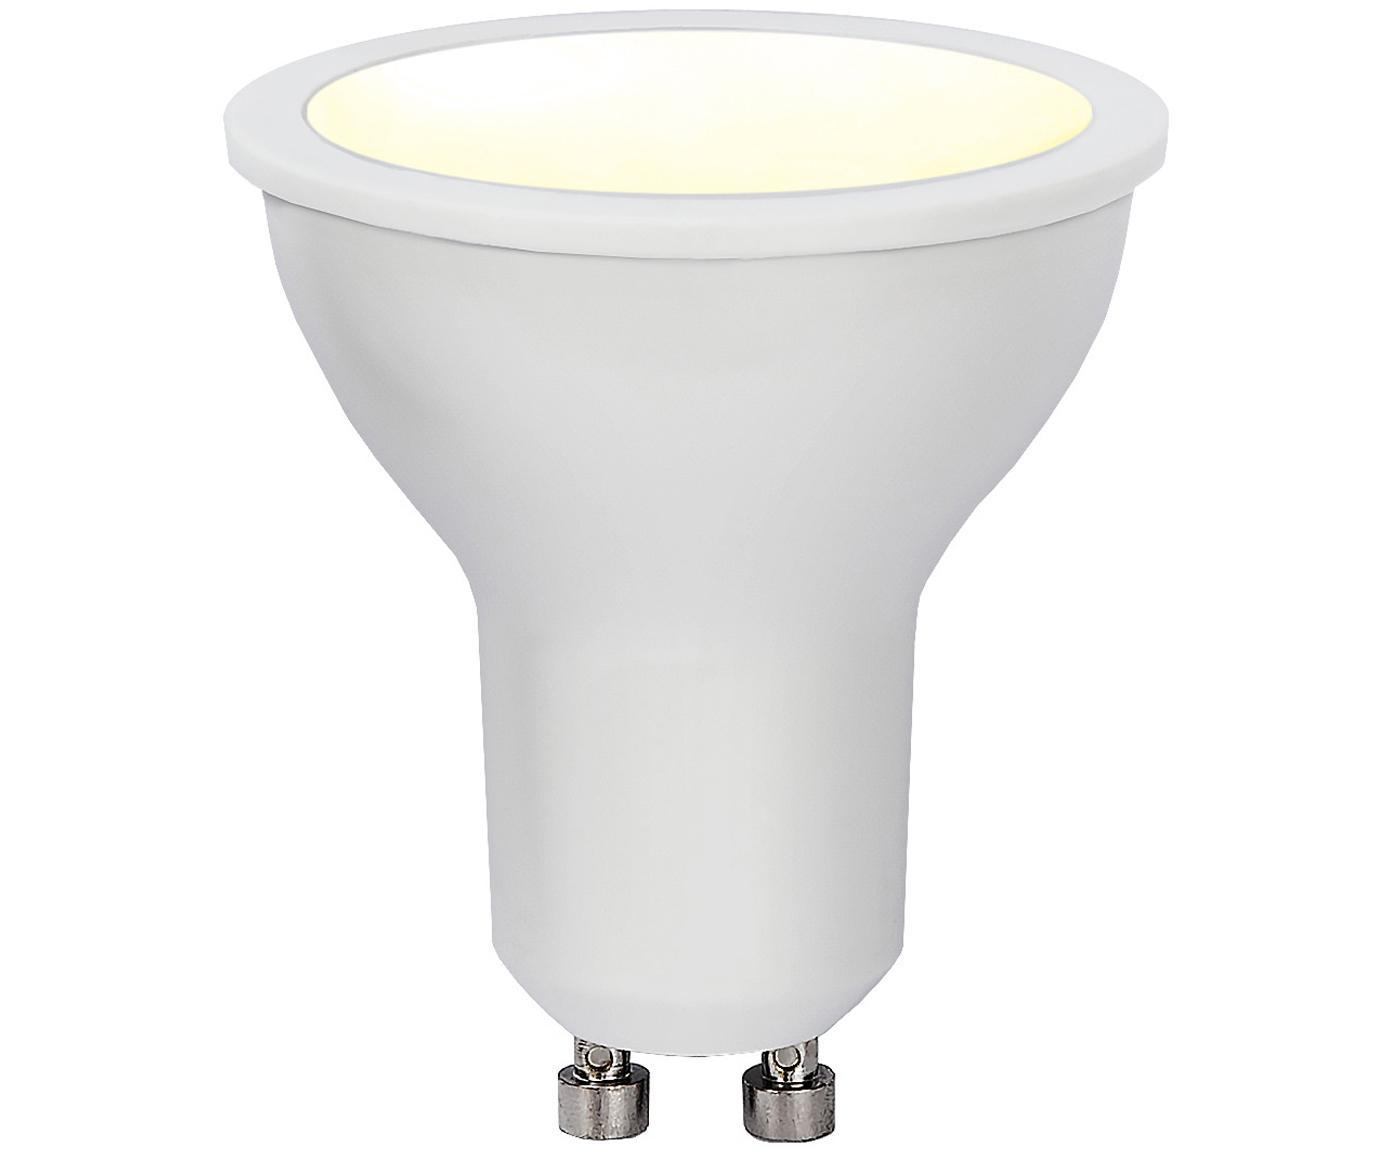 Dimbaar LED lamp Dim To Warm (GU10/6W), Peertje: kunststof, Fitting: aluminium, Wit, Ø 5 x H 6 cm